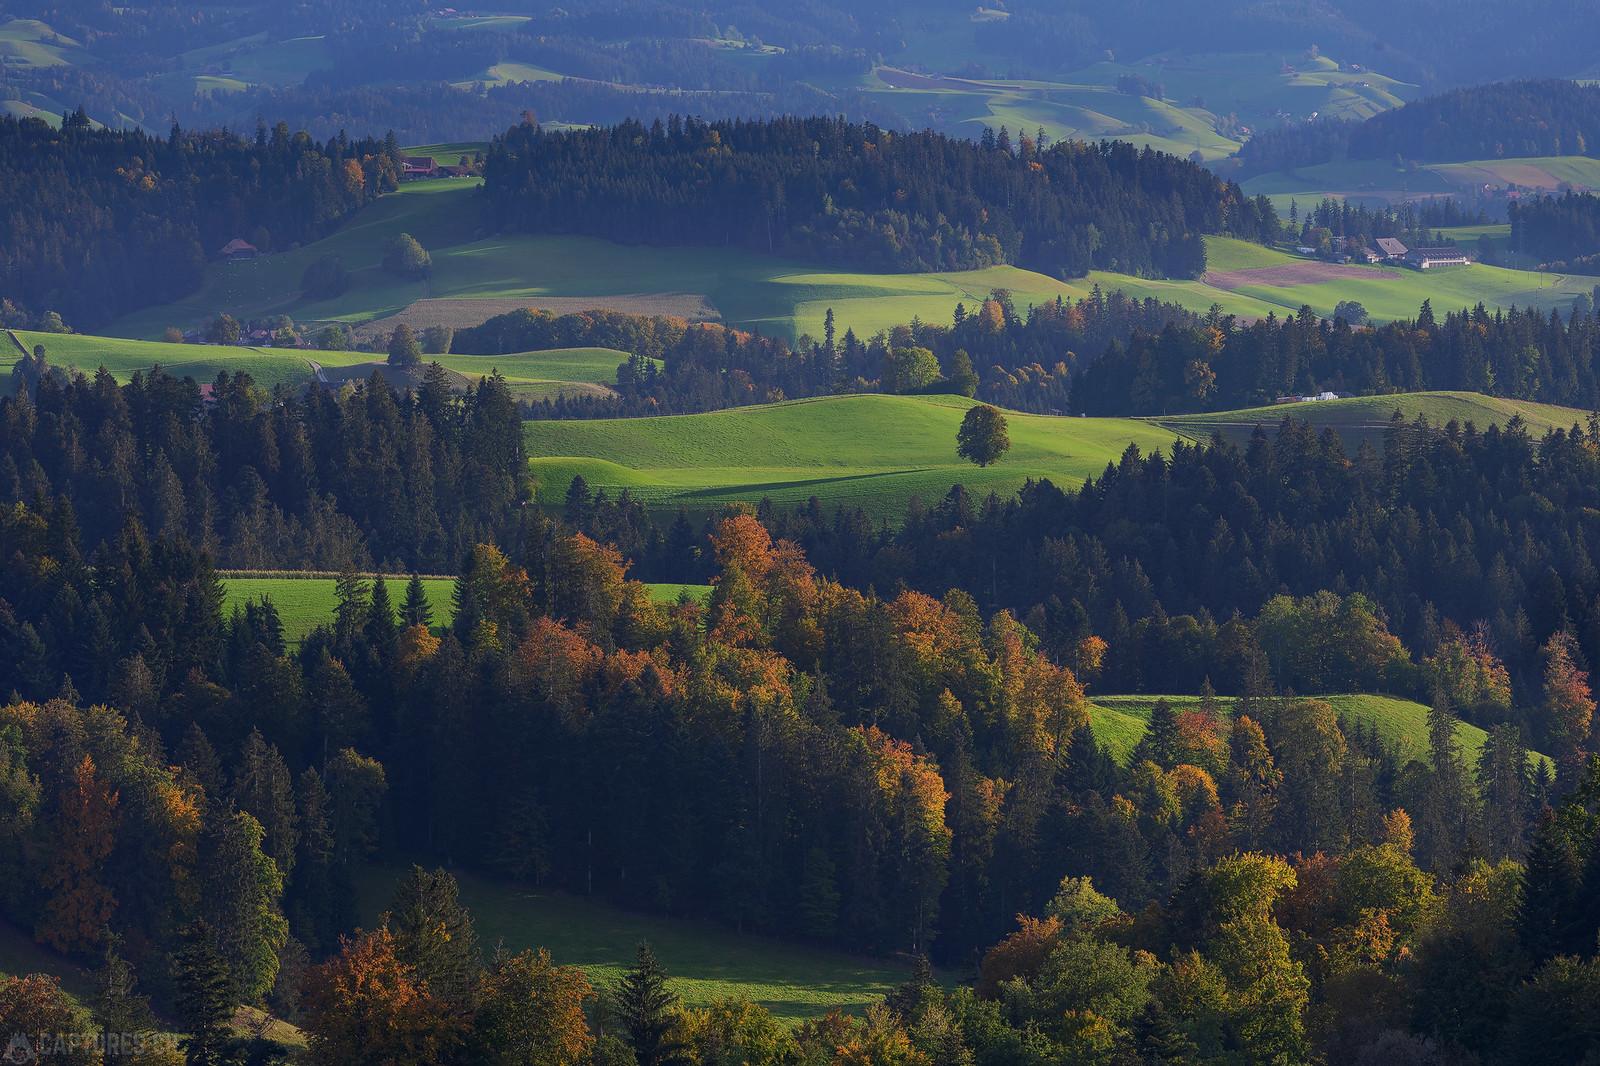 Fall trees - Lueg